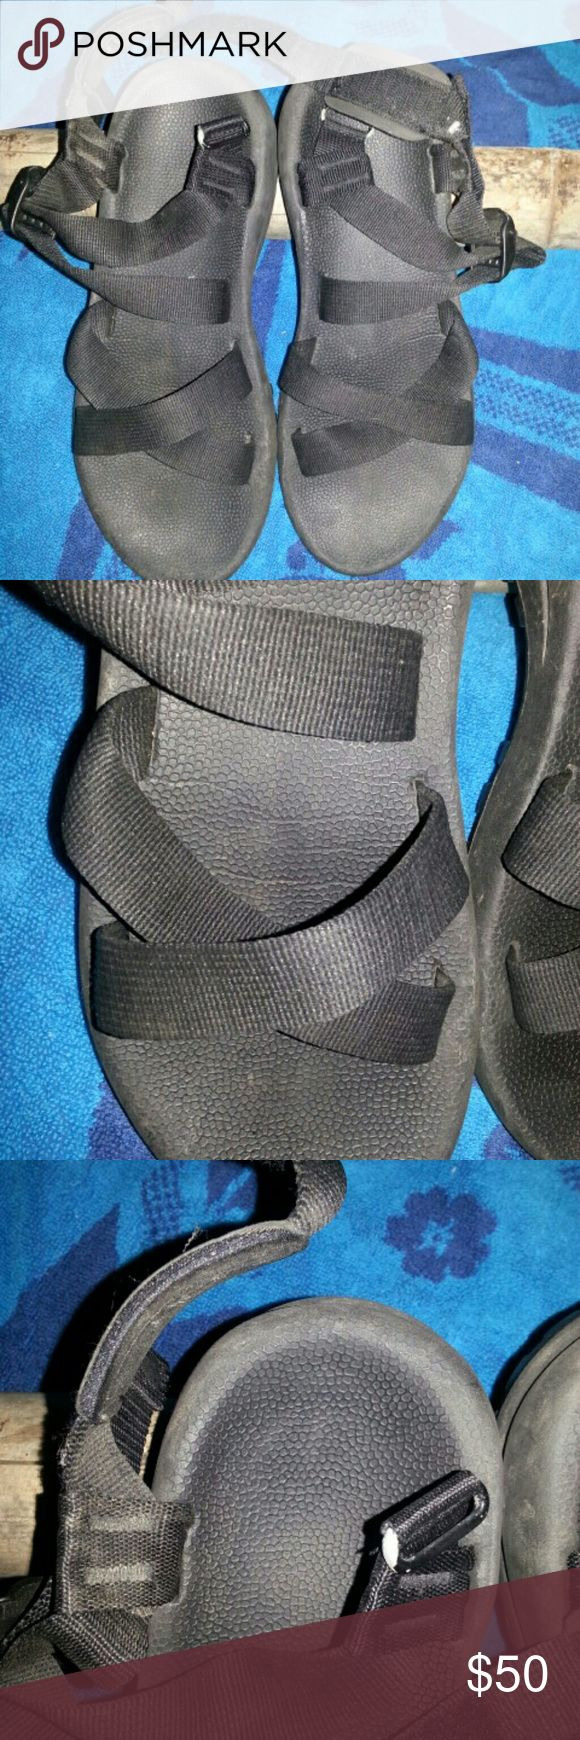 Merrill Men's Sandals Adjustable strap all weather & washable Merrill Shoes Sandals & Flip-Flops